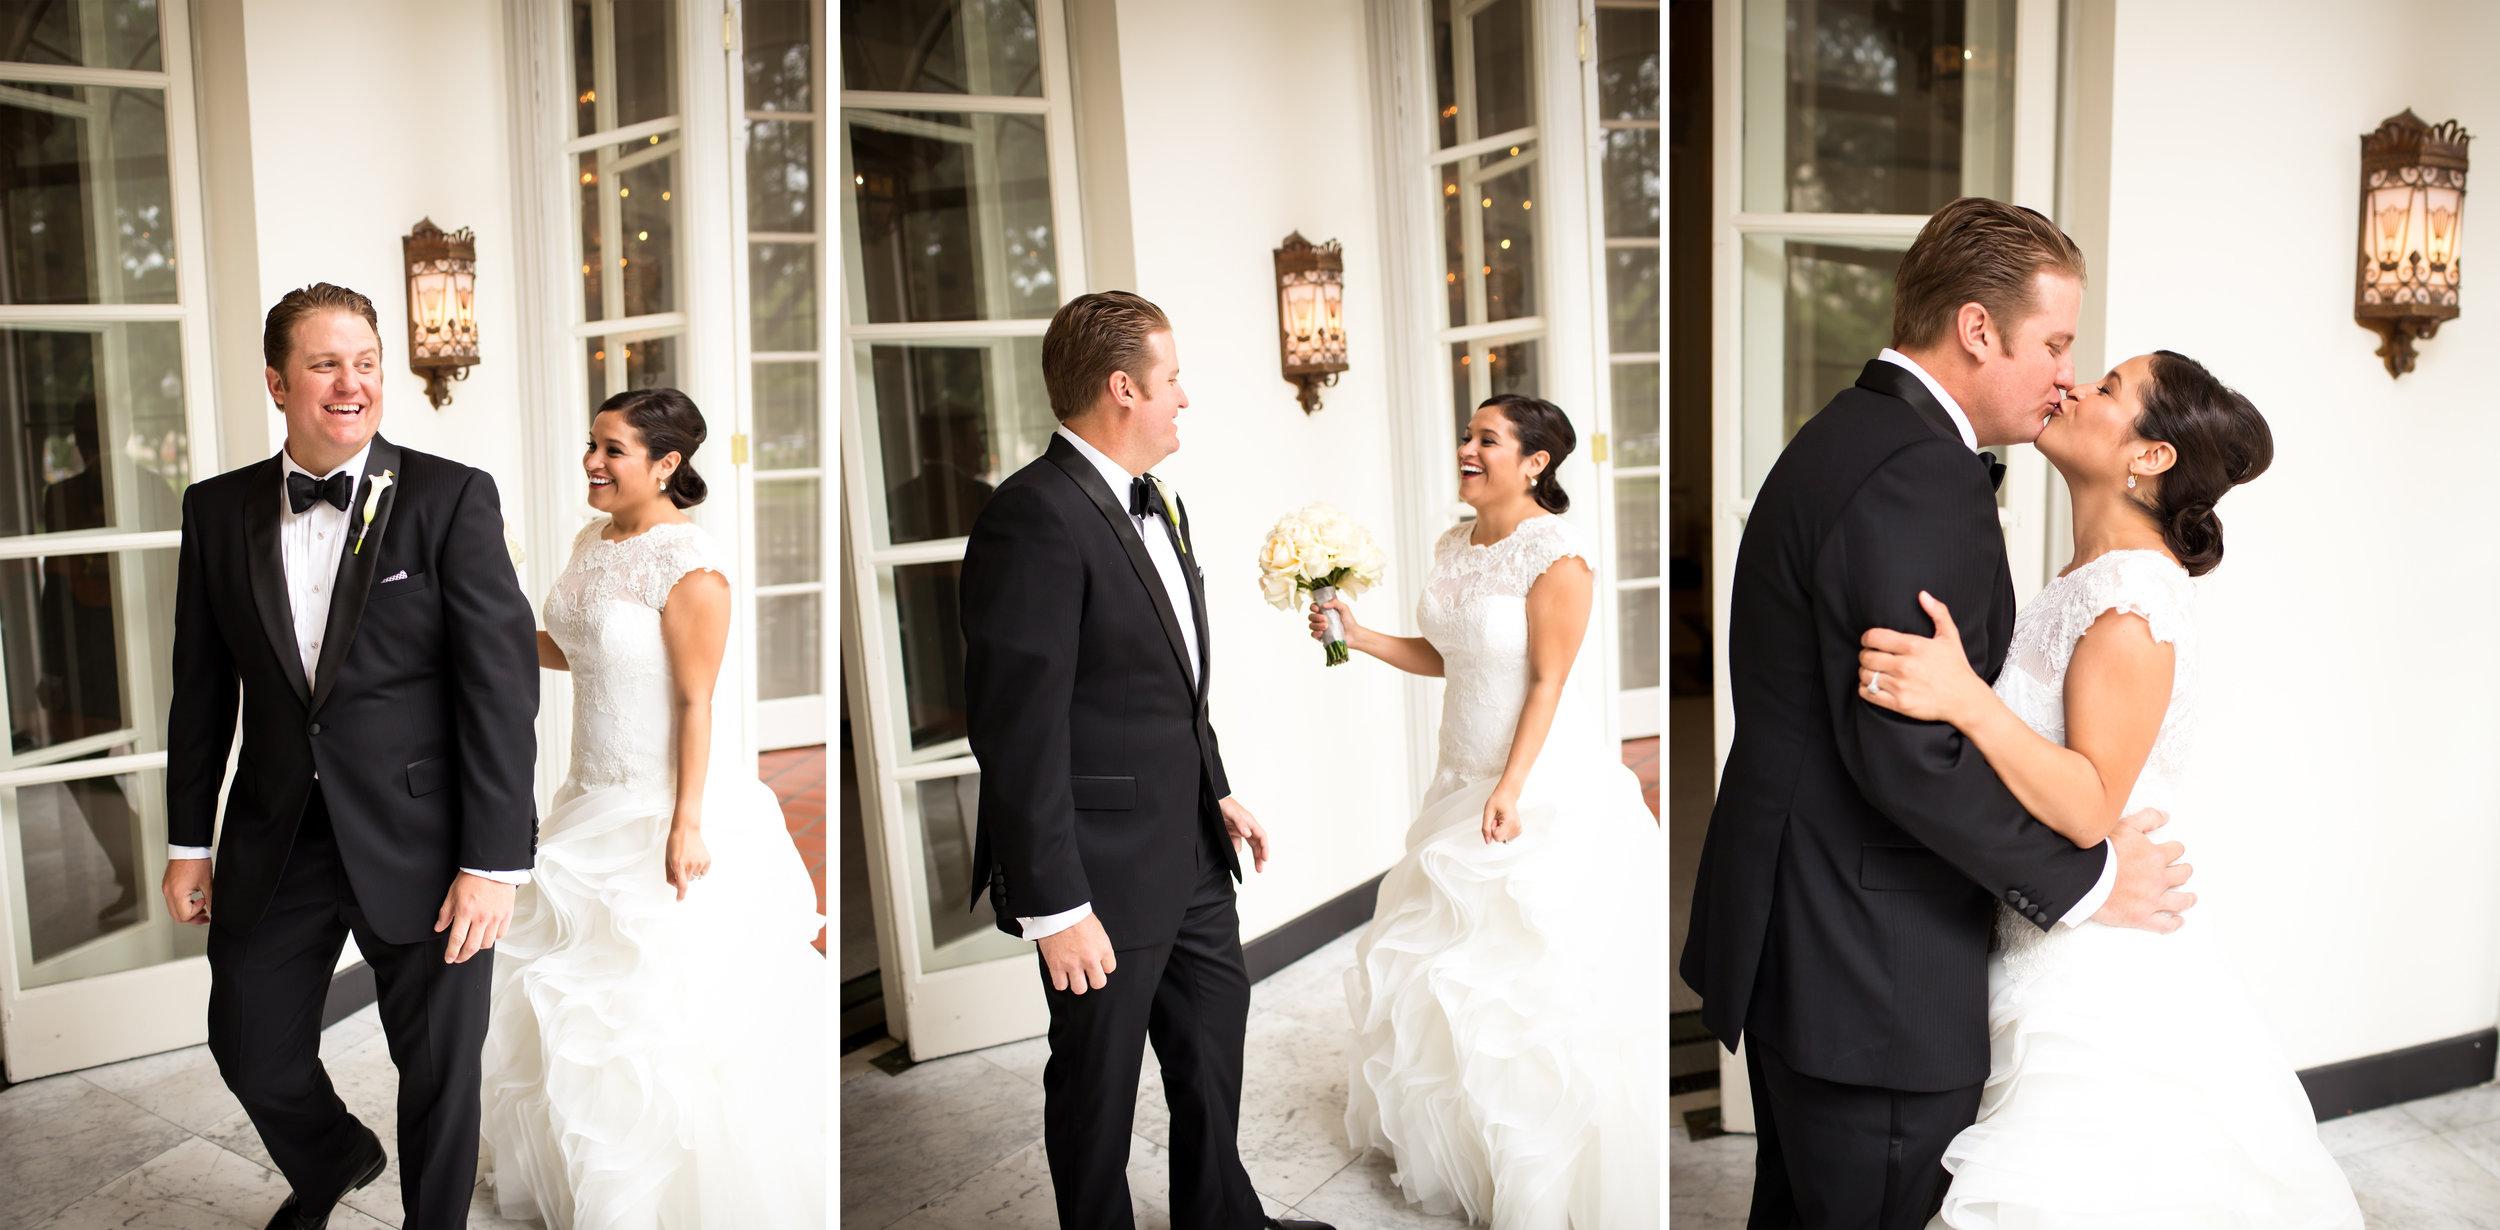 Marble_Falls_Horseshoe_Bay_Photographer_Torres_Wedding_16.jpg